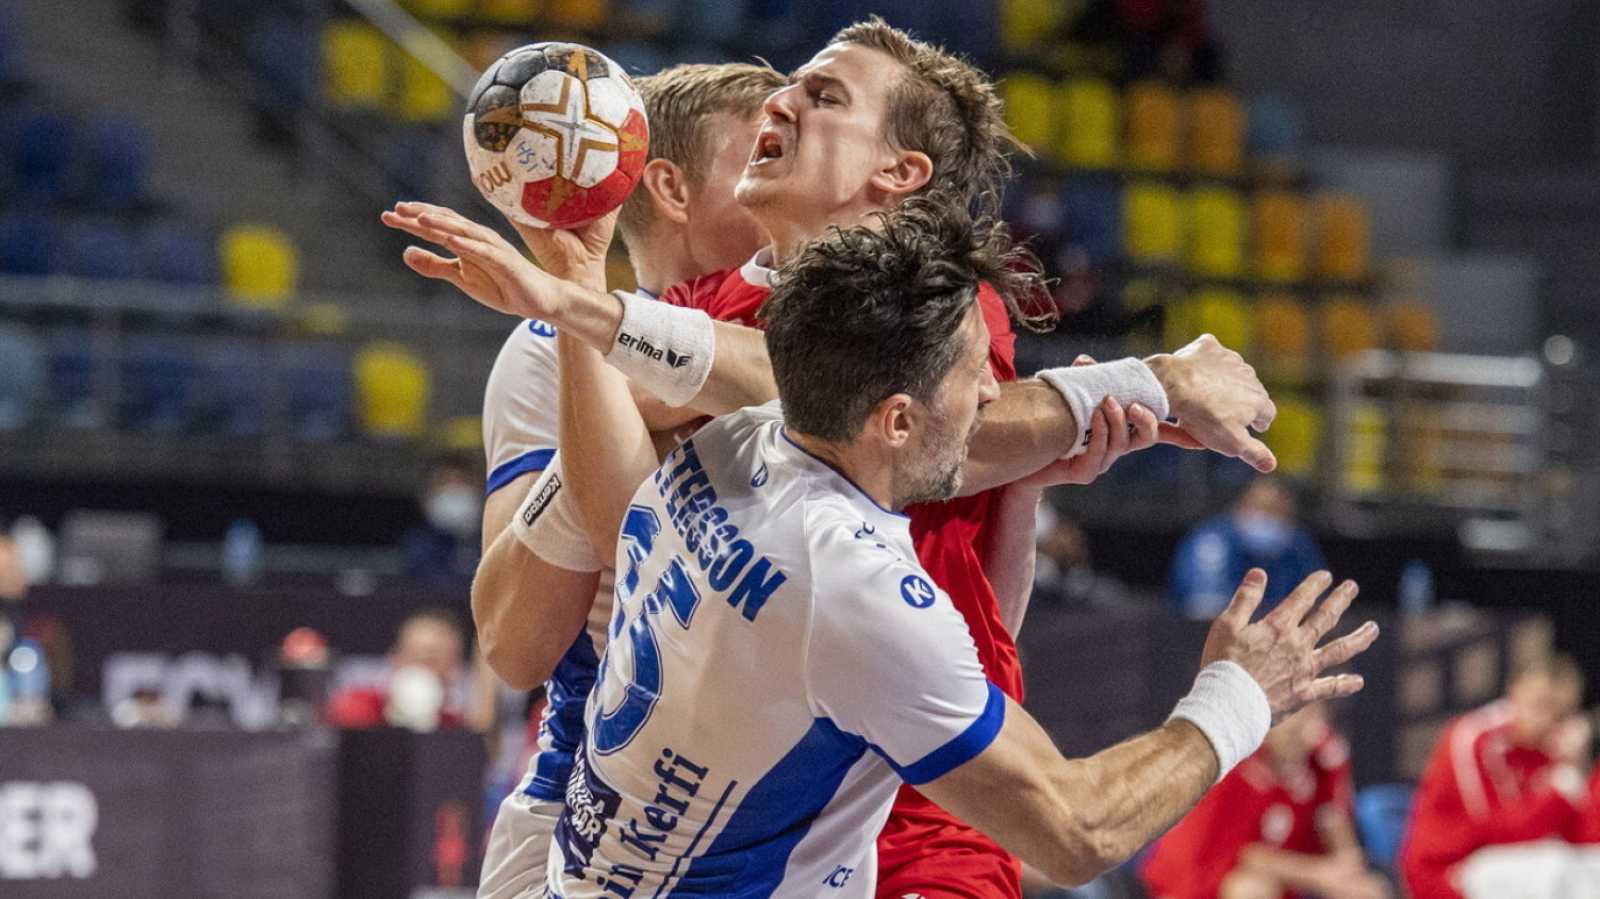 Balonmano - Campeonato del Mundo masculino. 2ª fase: Suiza - Islandia - ver ahora